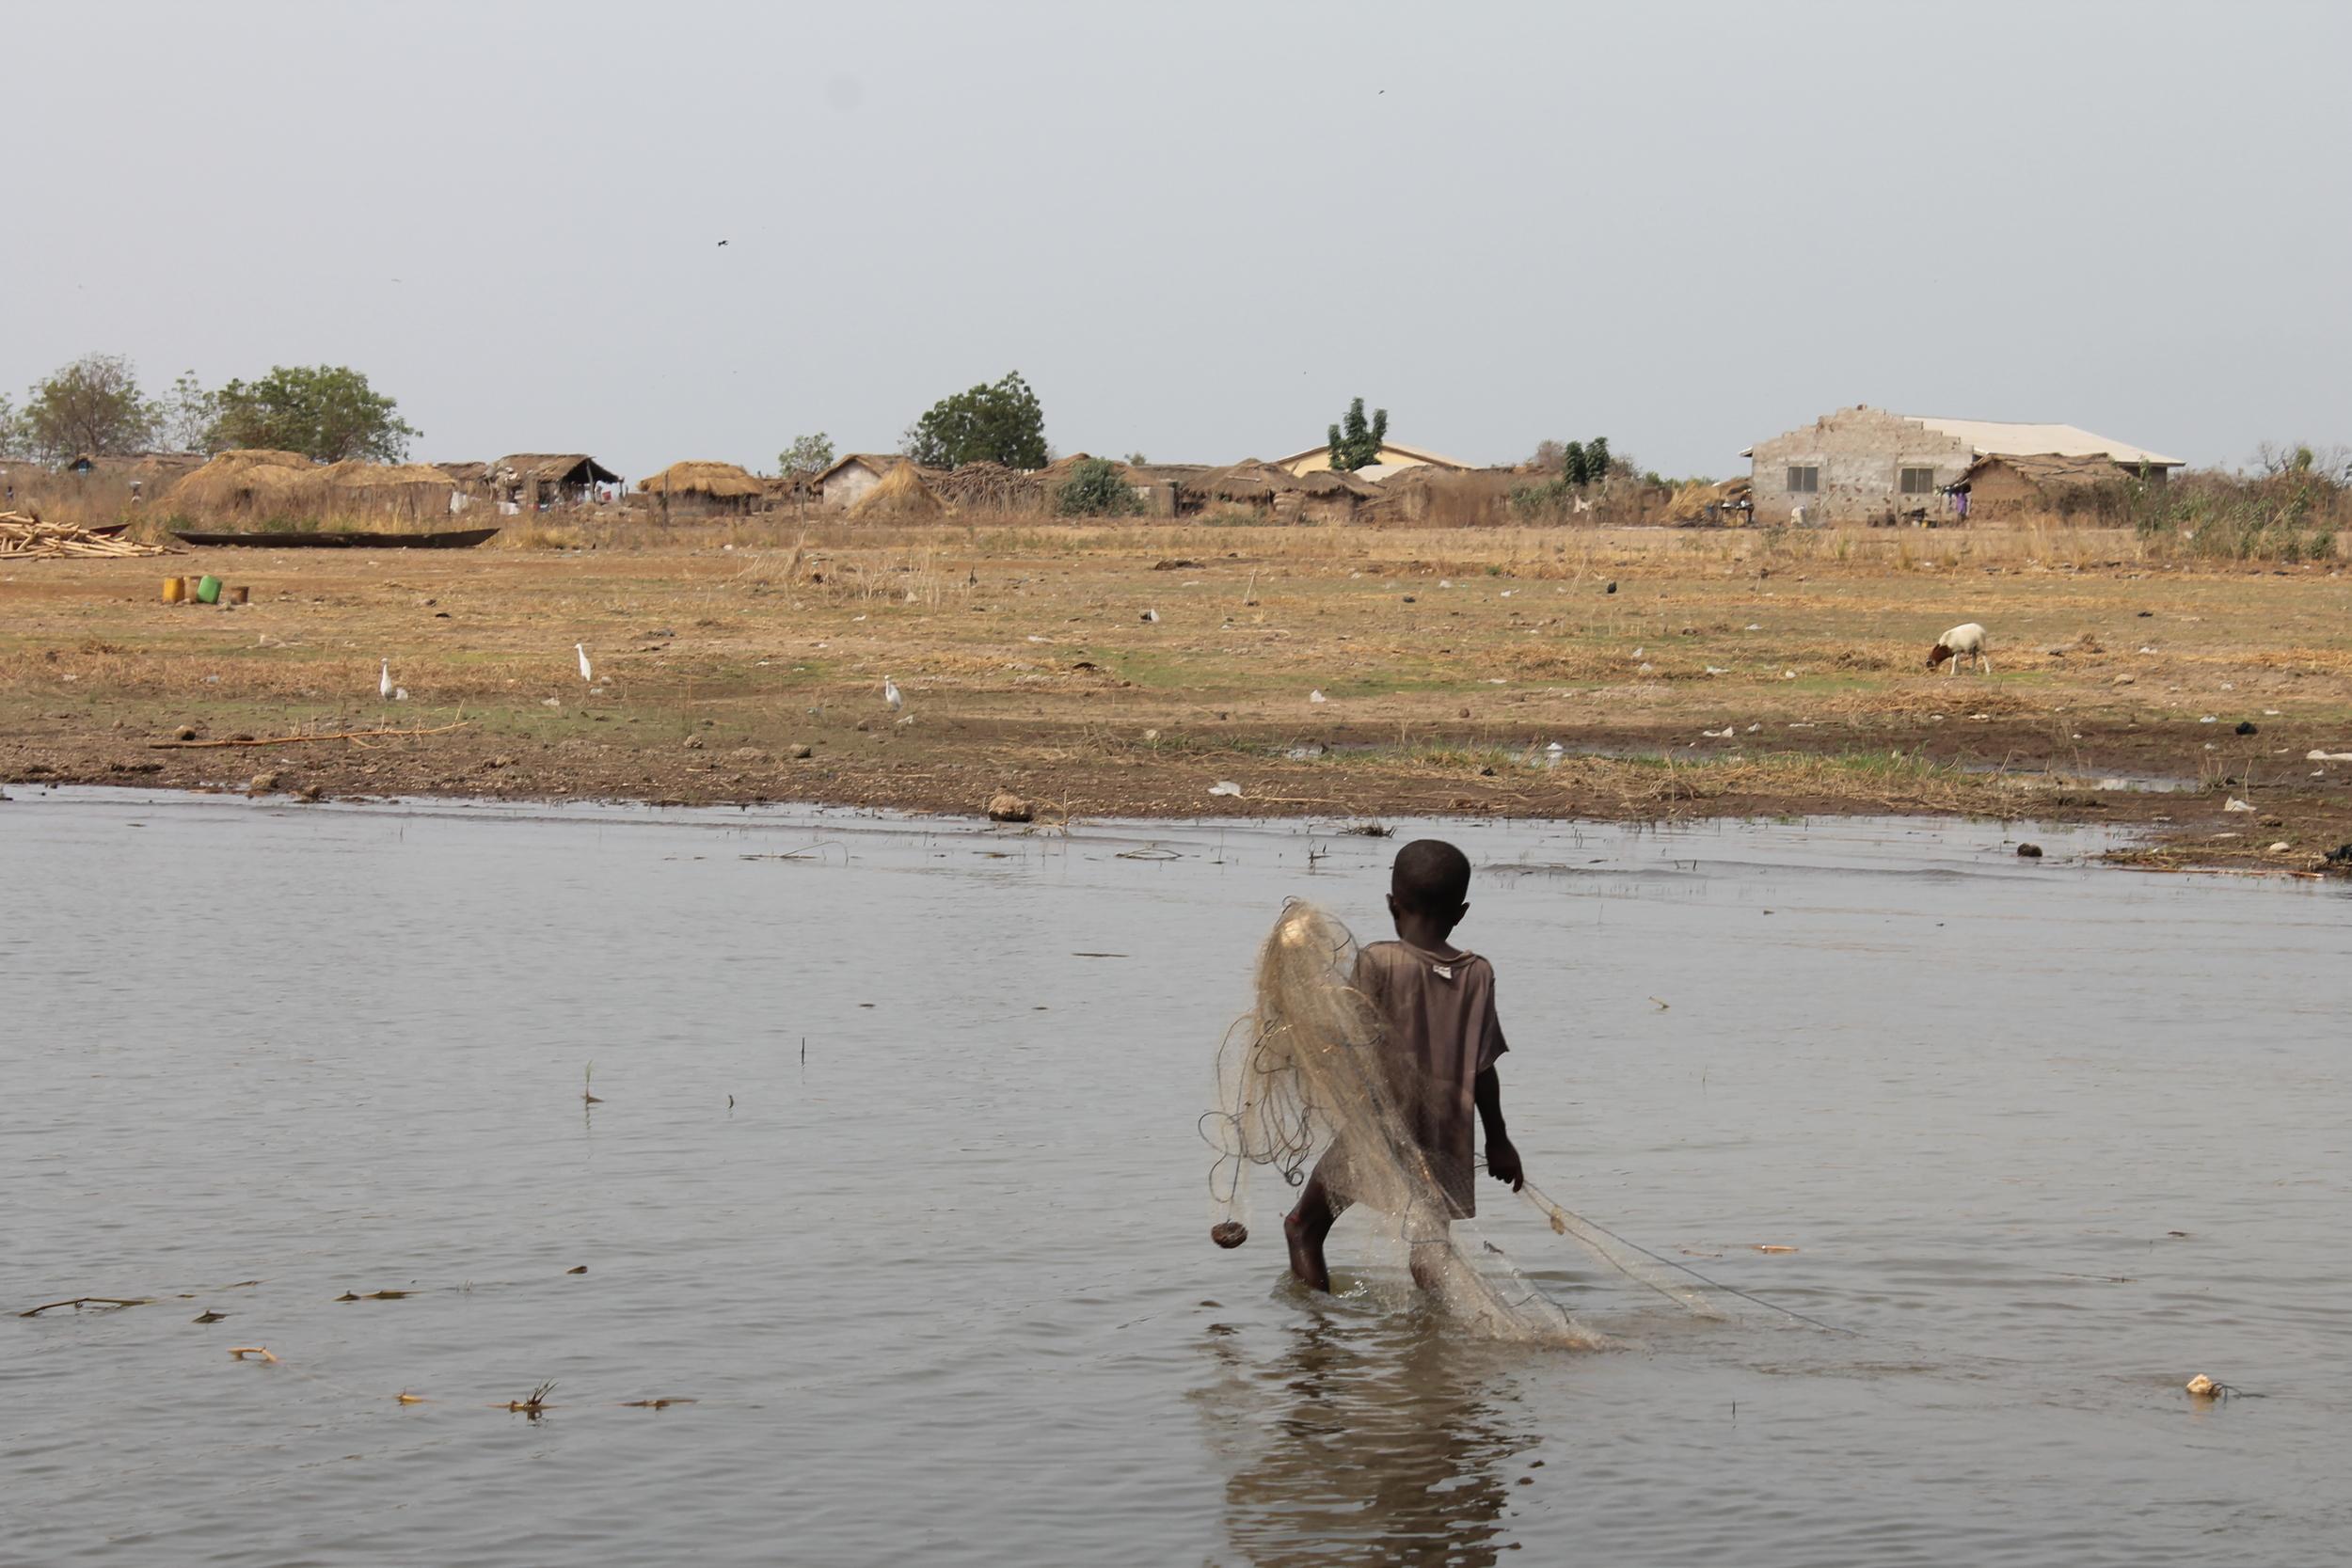 A small boy hoists a fishing net on Lake Volta